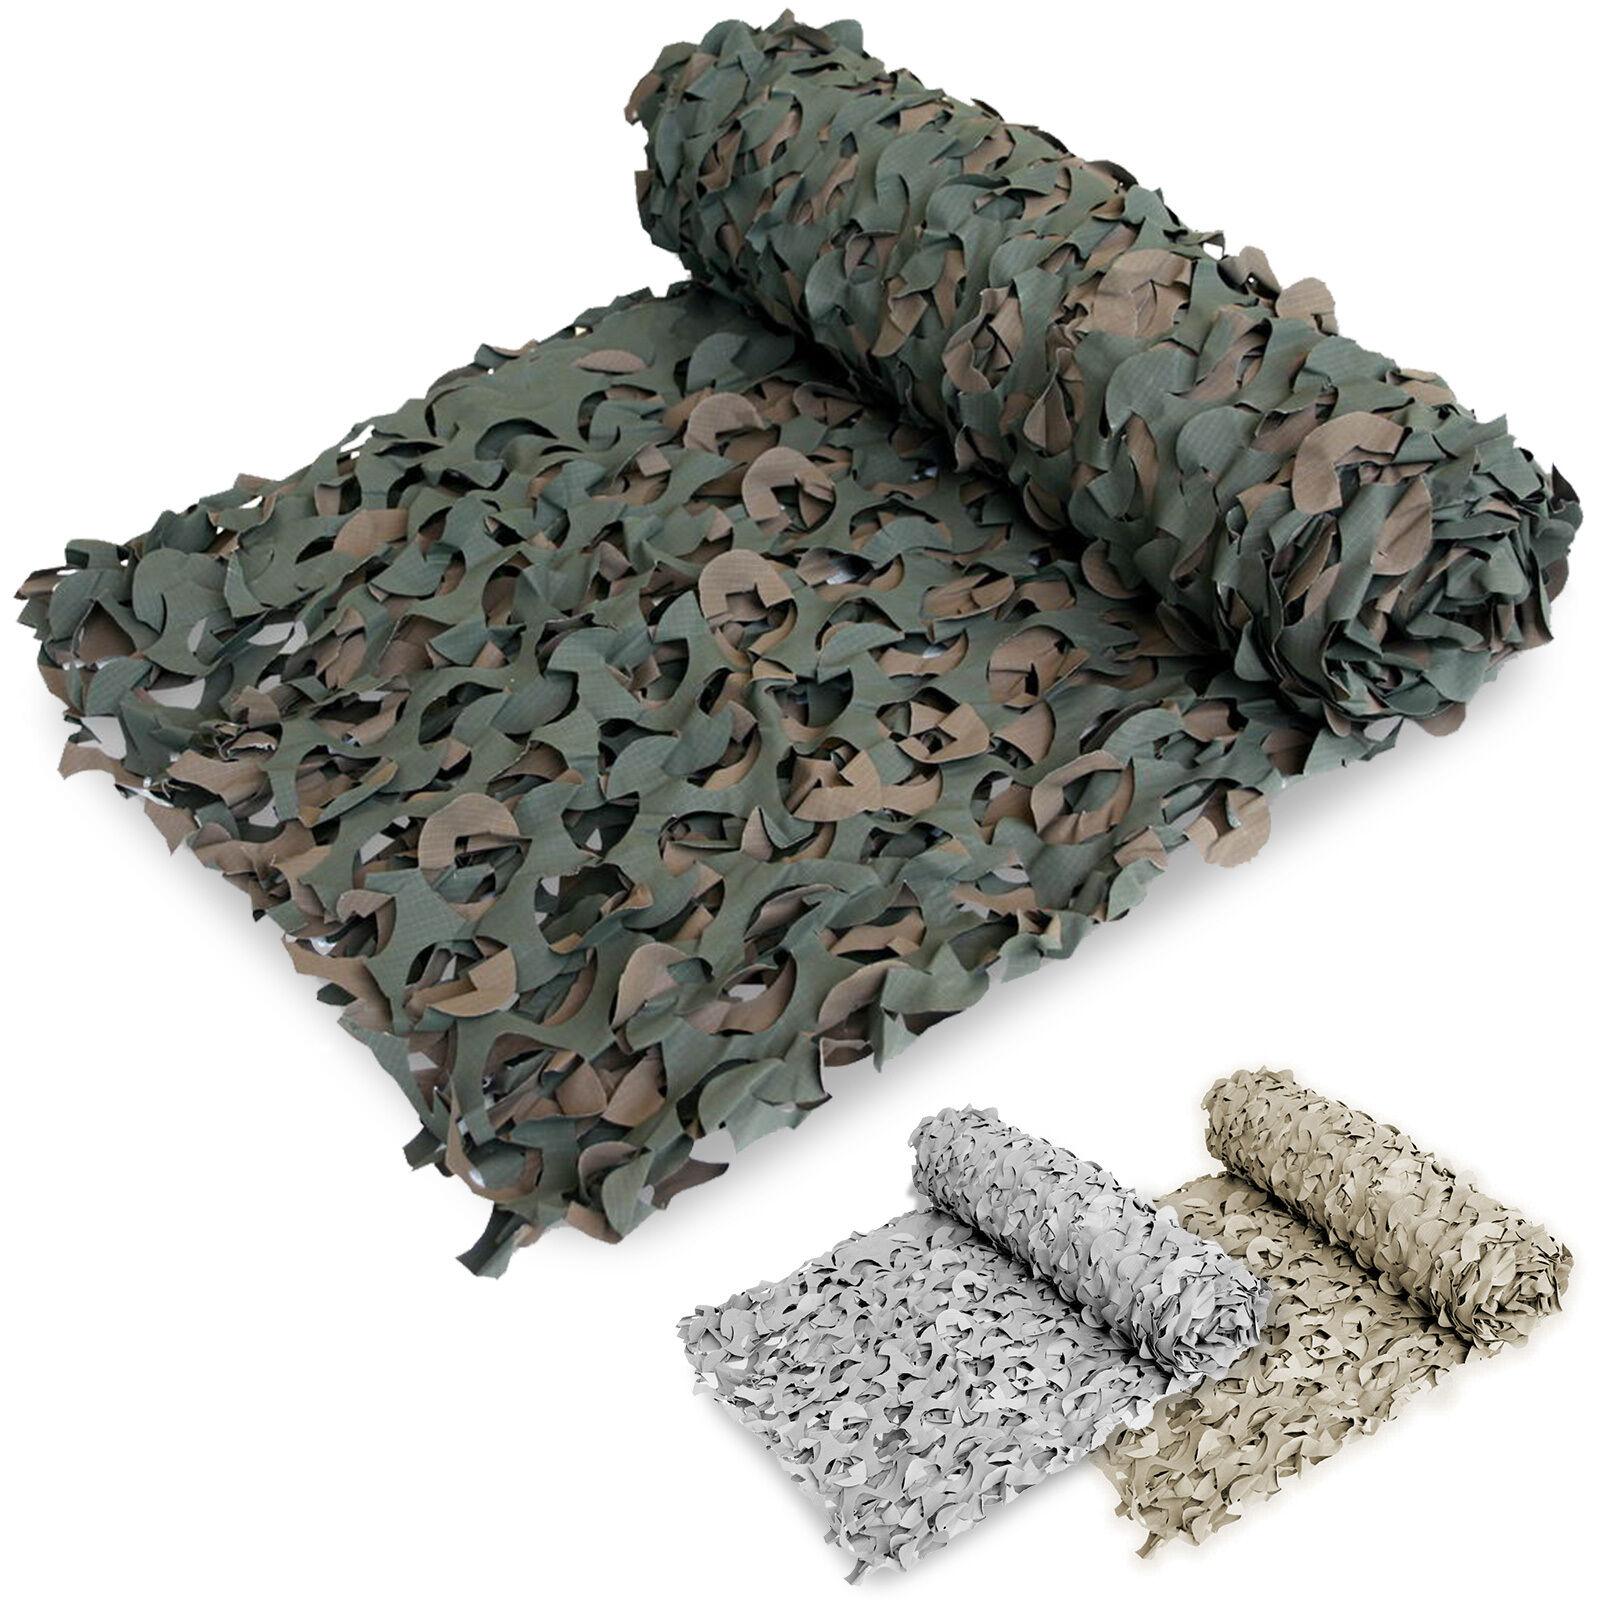 Camuflaje Camo Ejército Militar Caza Tiro Malla Net Ocultar Cubierta 3 X 2.4 M